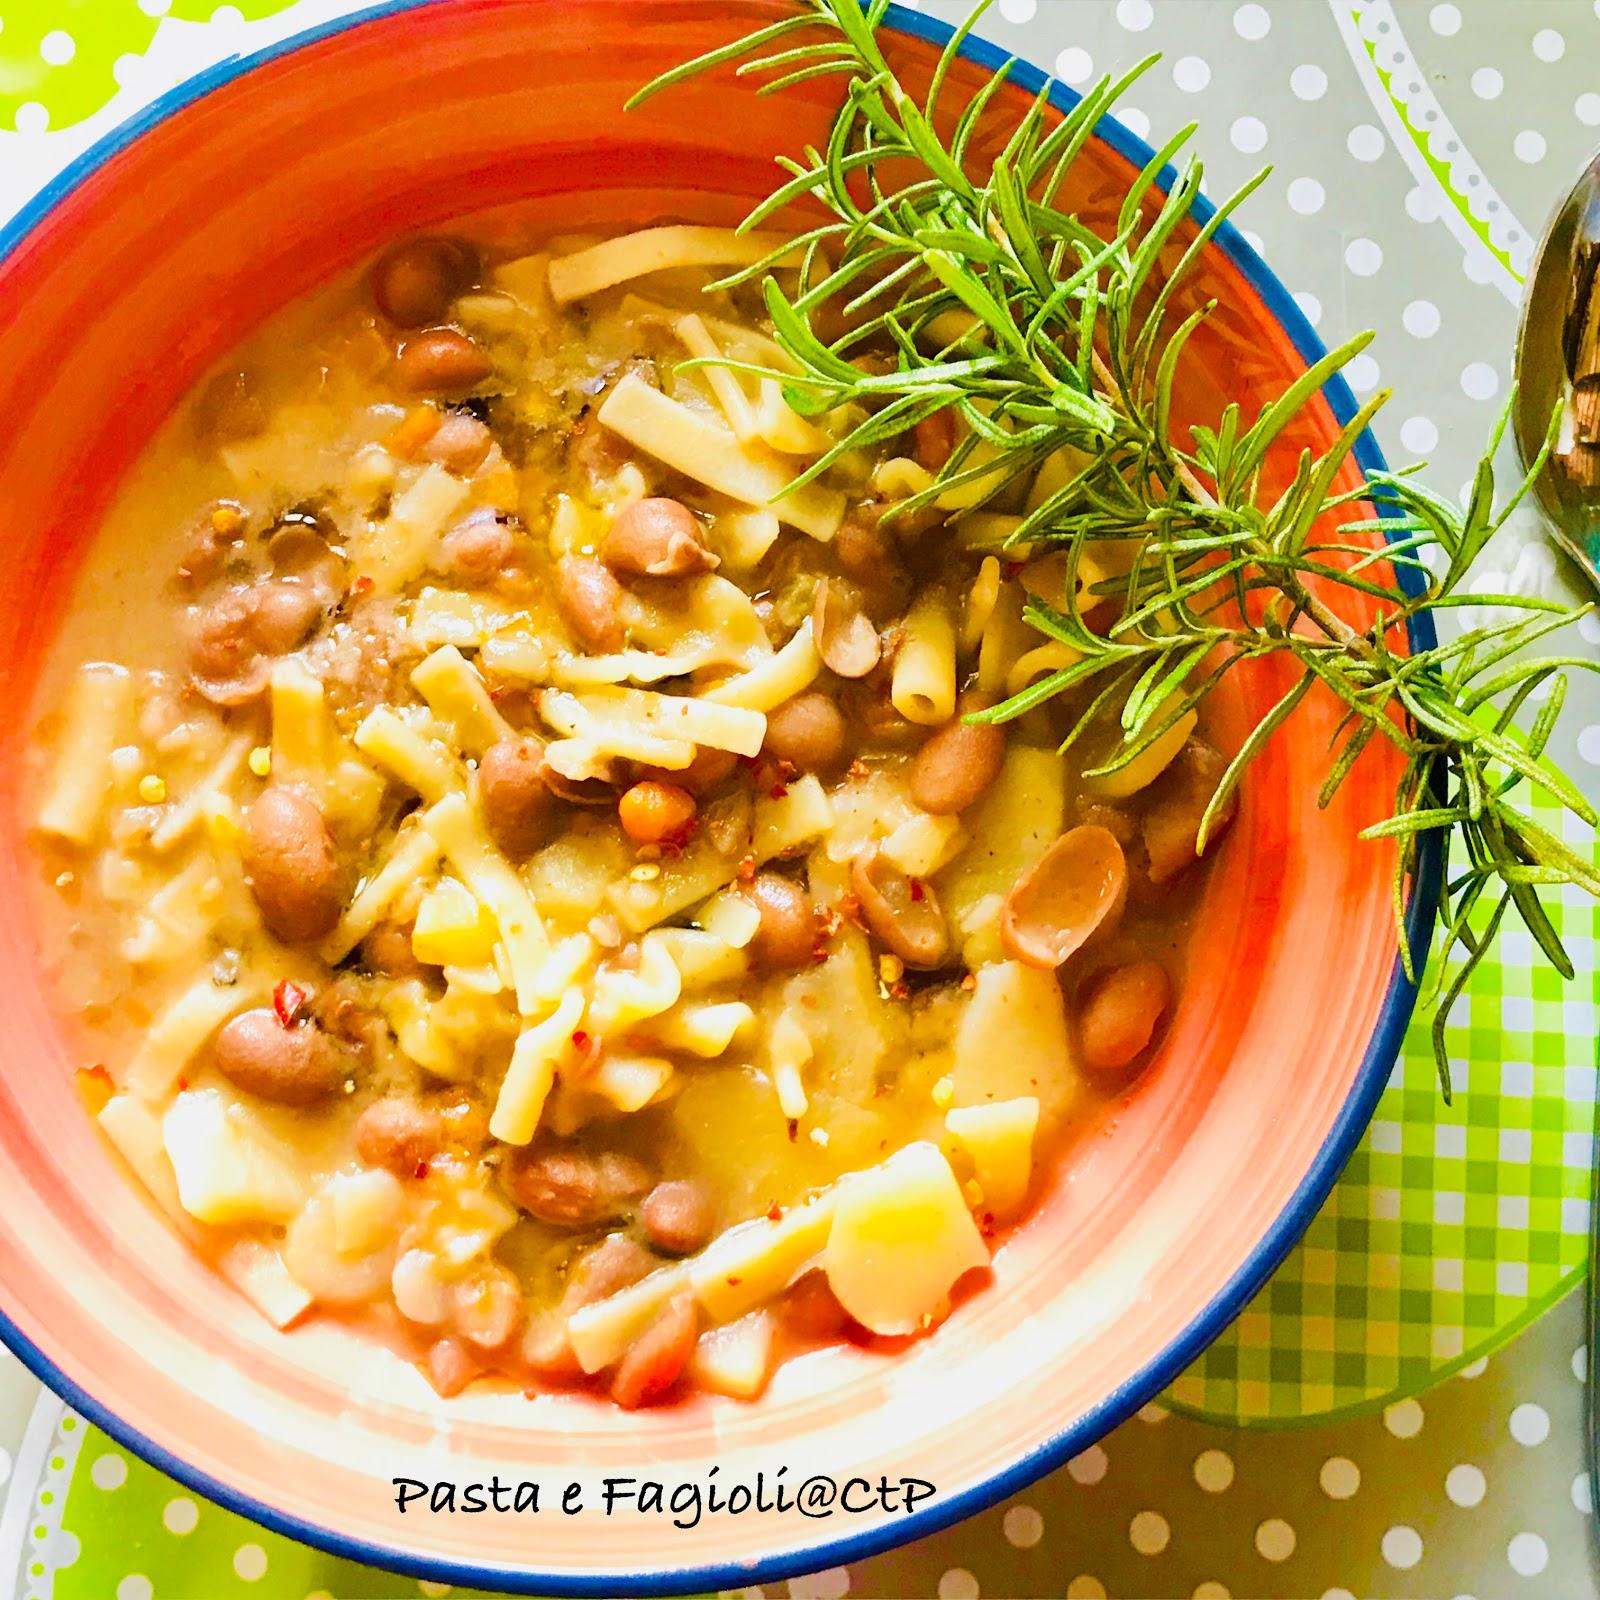 Pasta e fagioli e patate Alessandra ruggeri